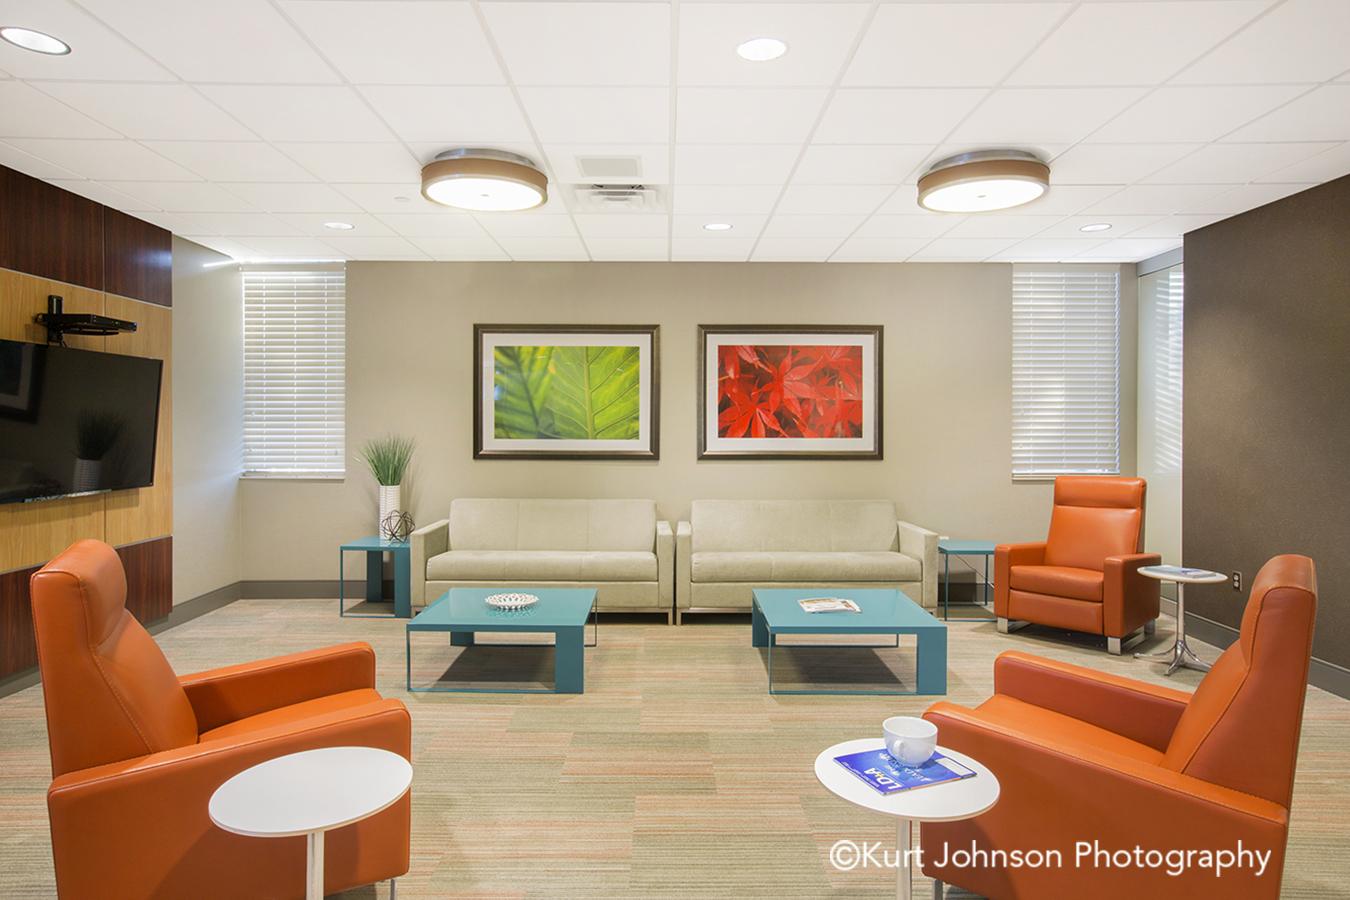 Bryan Health Nebraska NE healthcare framed art installation office lounge area waiting furniture interiors red green leaves orange